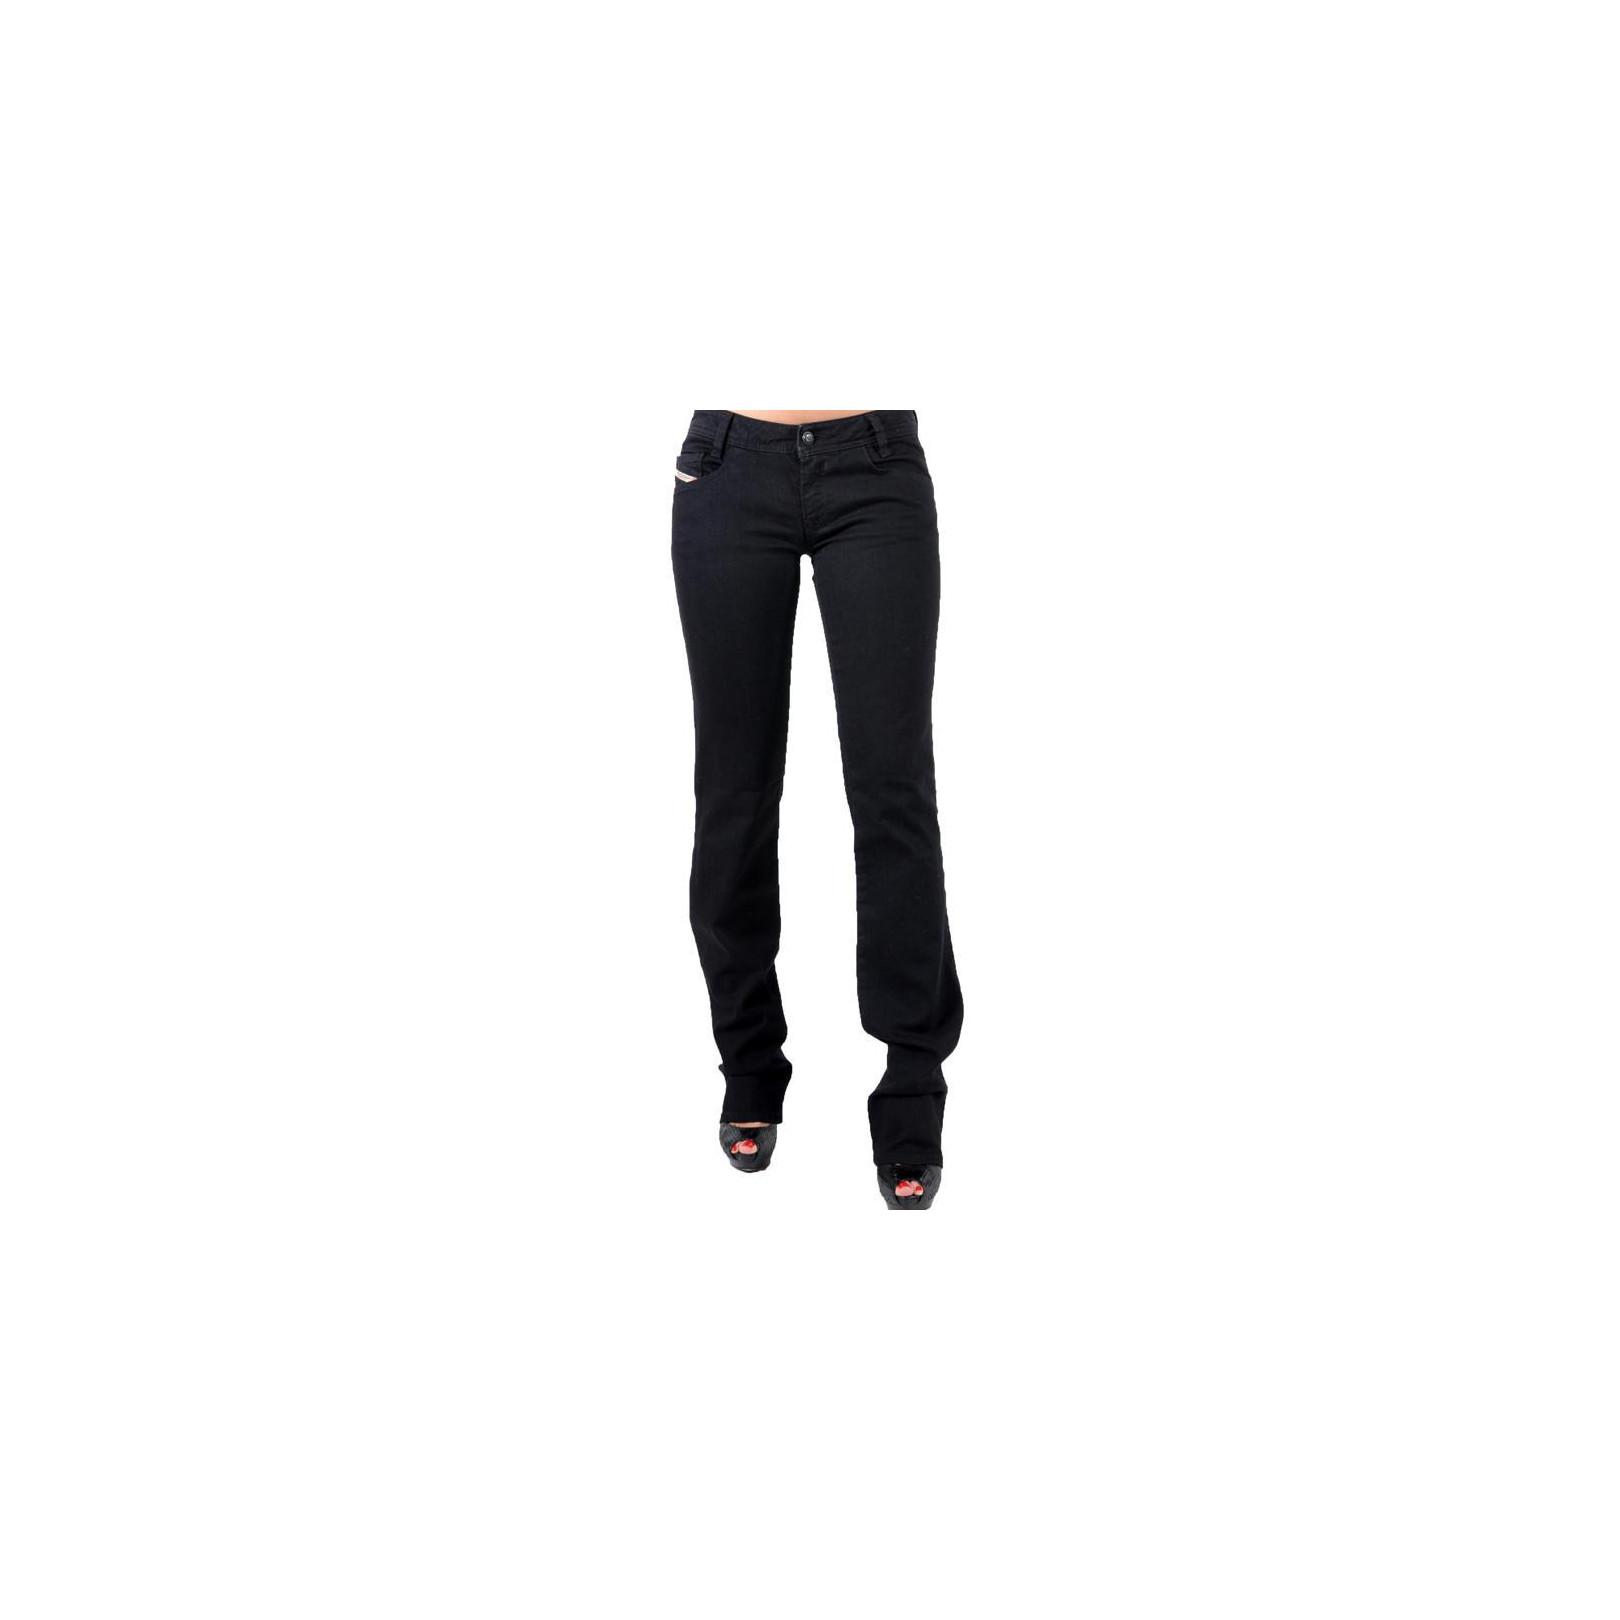 Jeans Diesel News 8XW